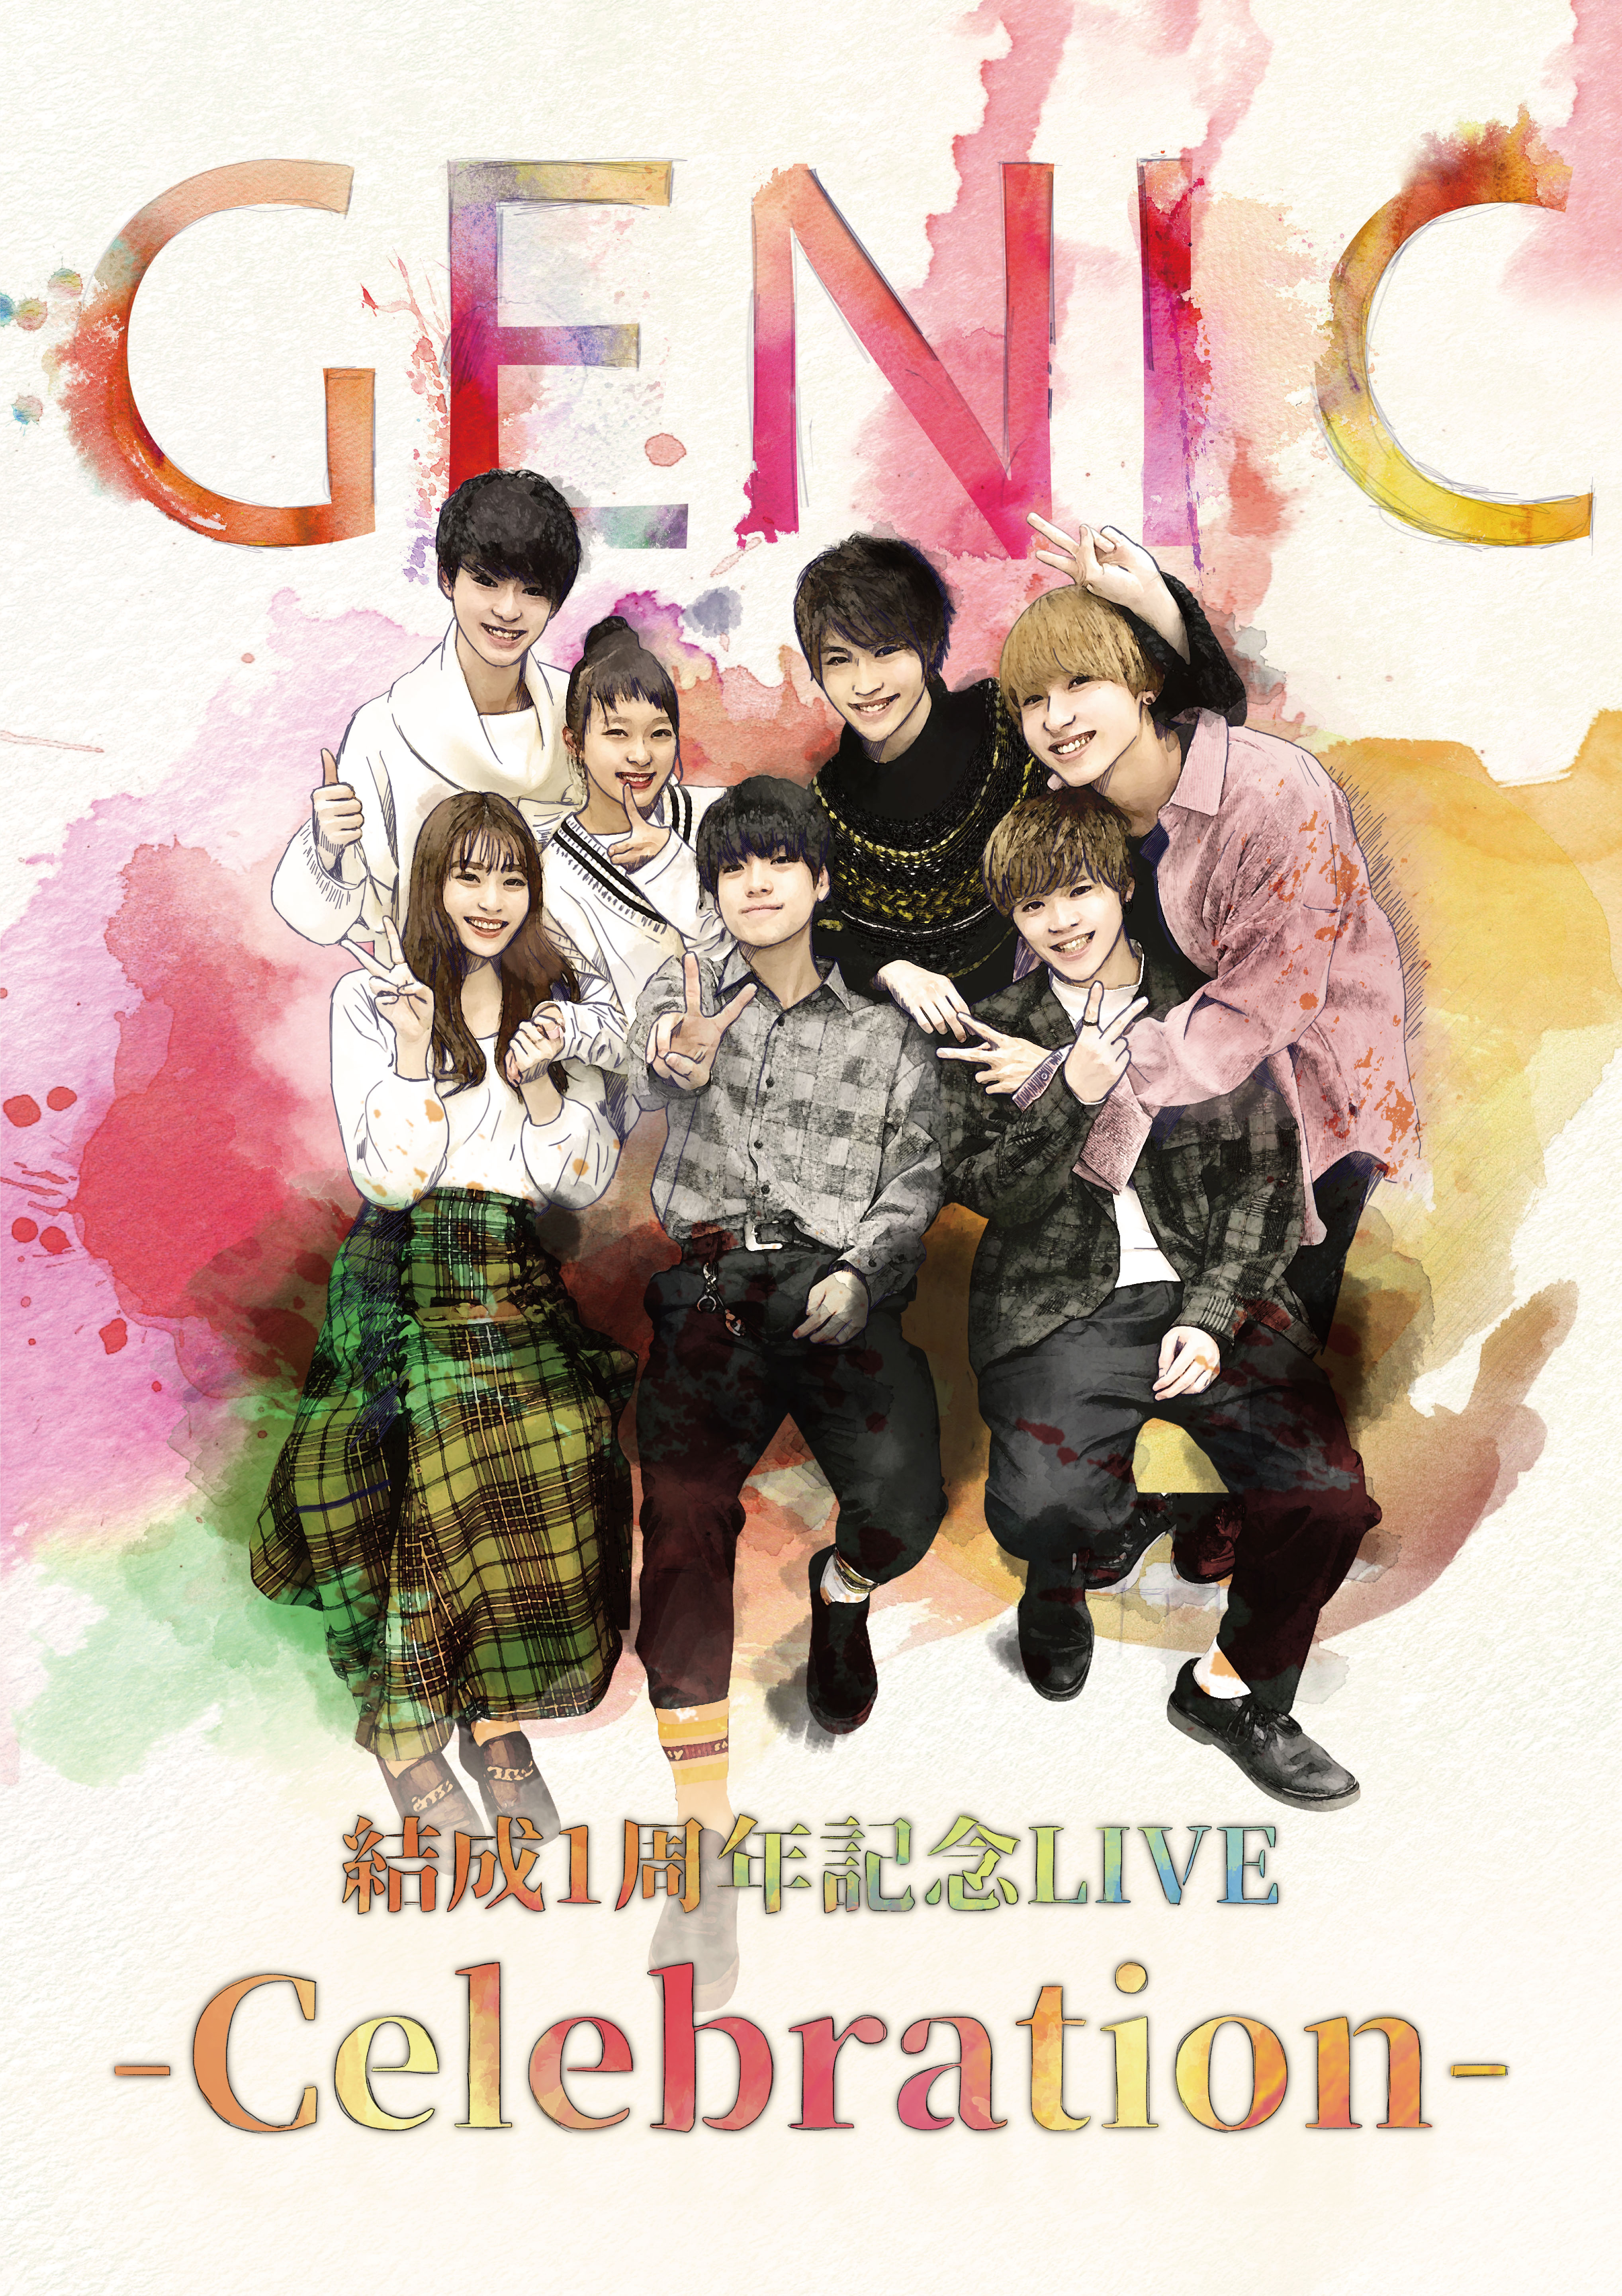 DVD&Blu-ray「結成1周年記念LIVE -Celebration-」<初回限定生産盤:GENICオリジナルグッズ>